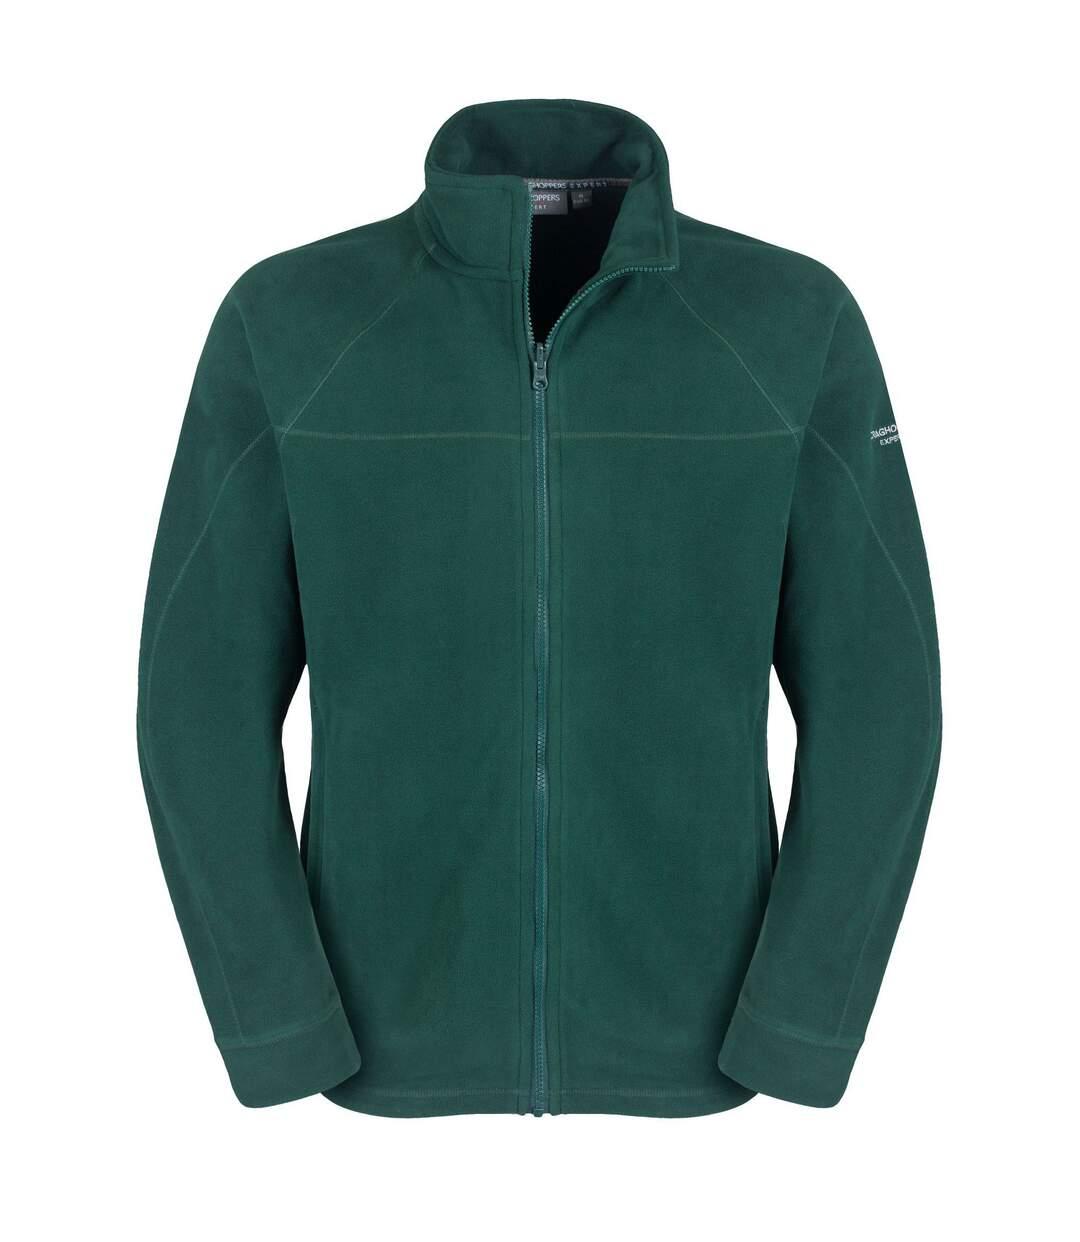 Craghoppers Mens Expert Basecamp Microfleece Full Zip Jacket (Dark Green) - UTCG794